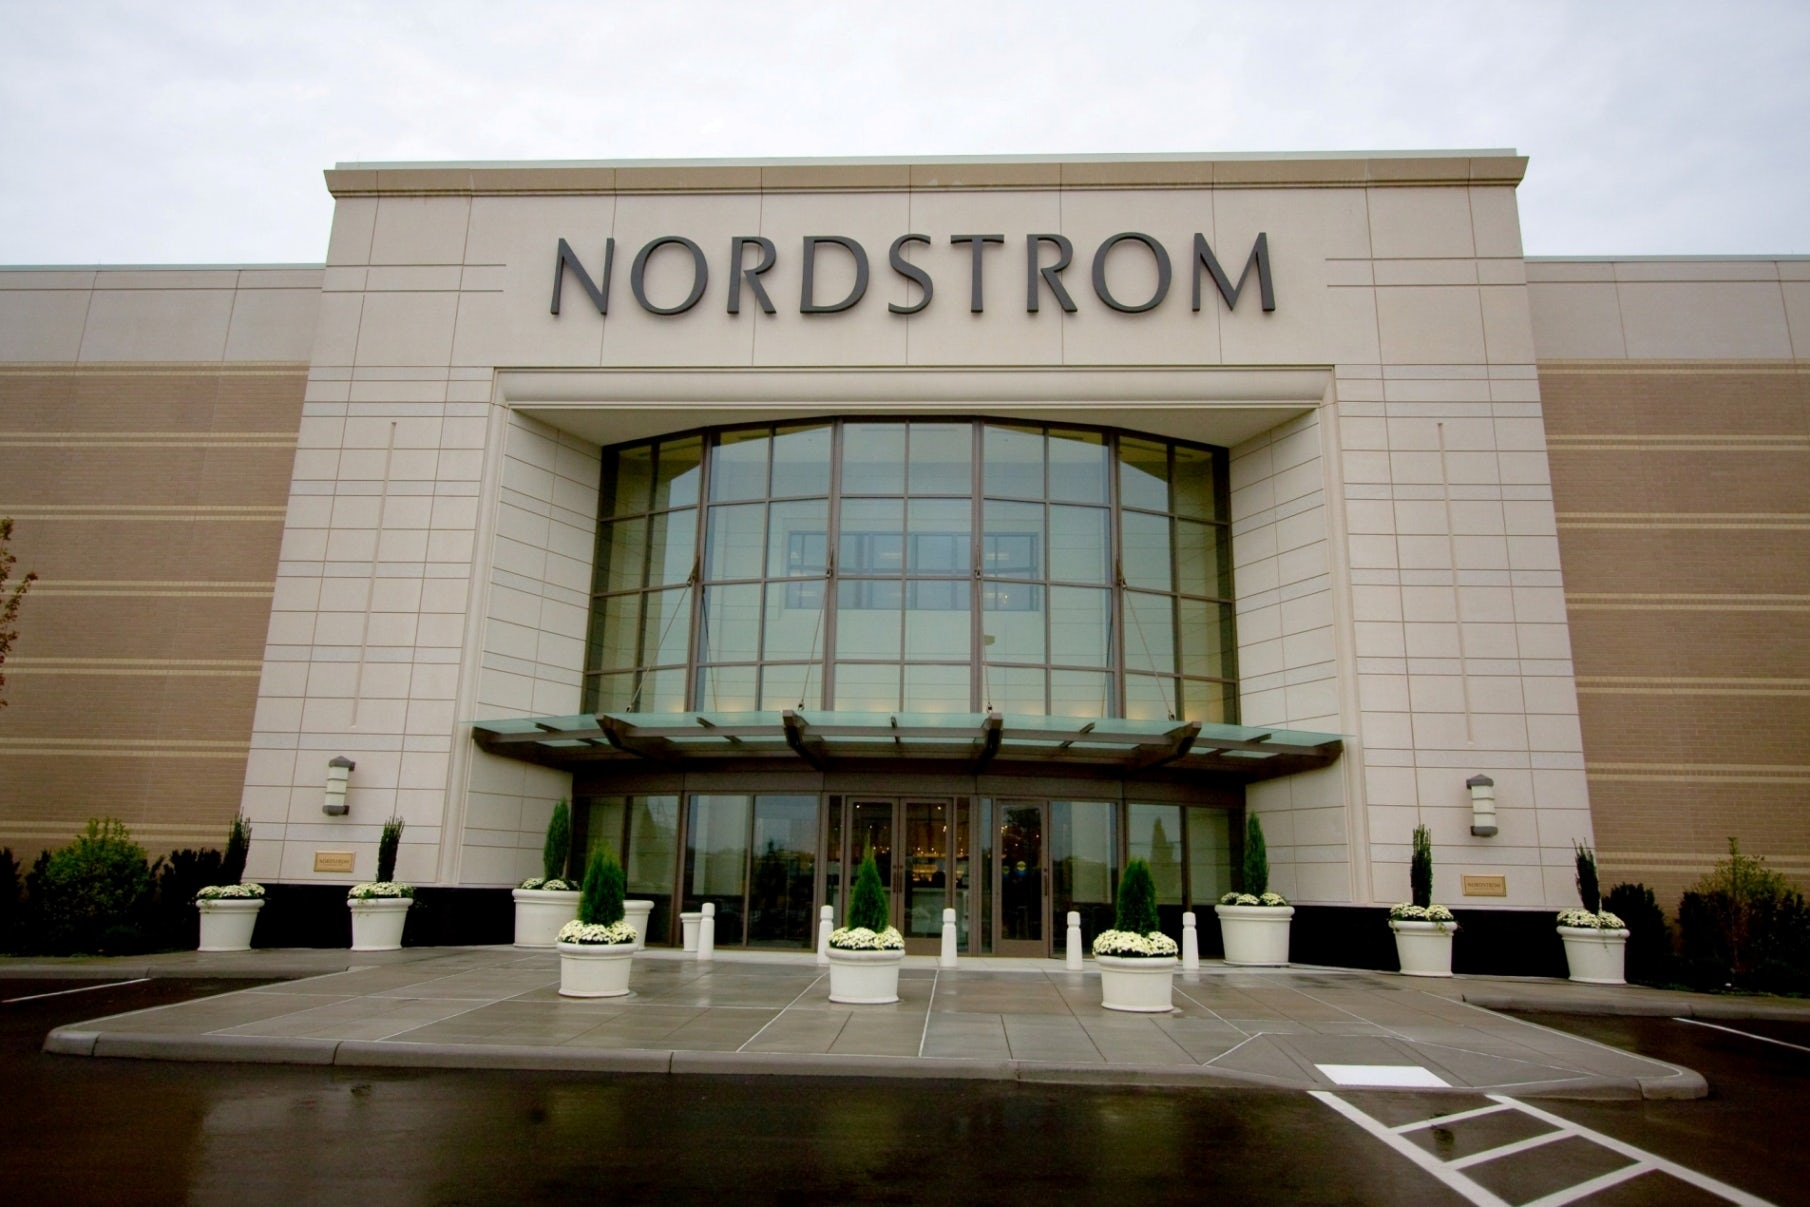 Nordstrom department Store | Source: Nordstrom